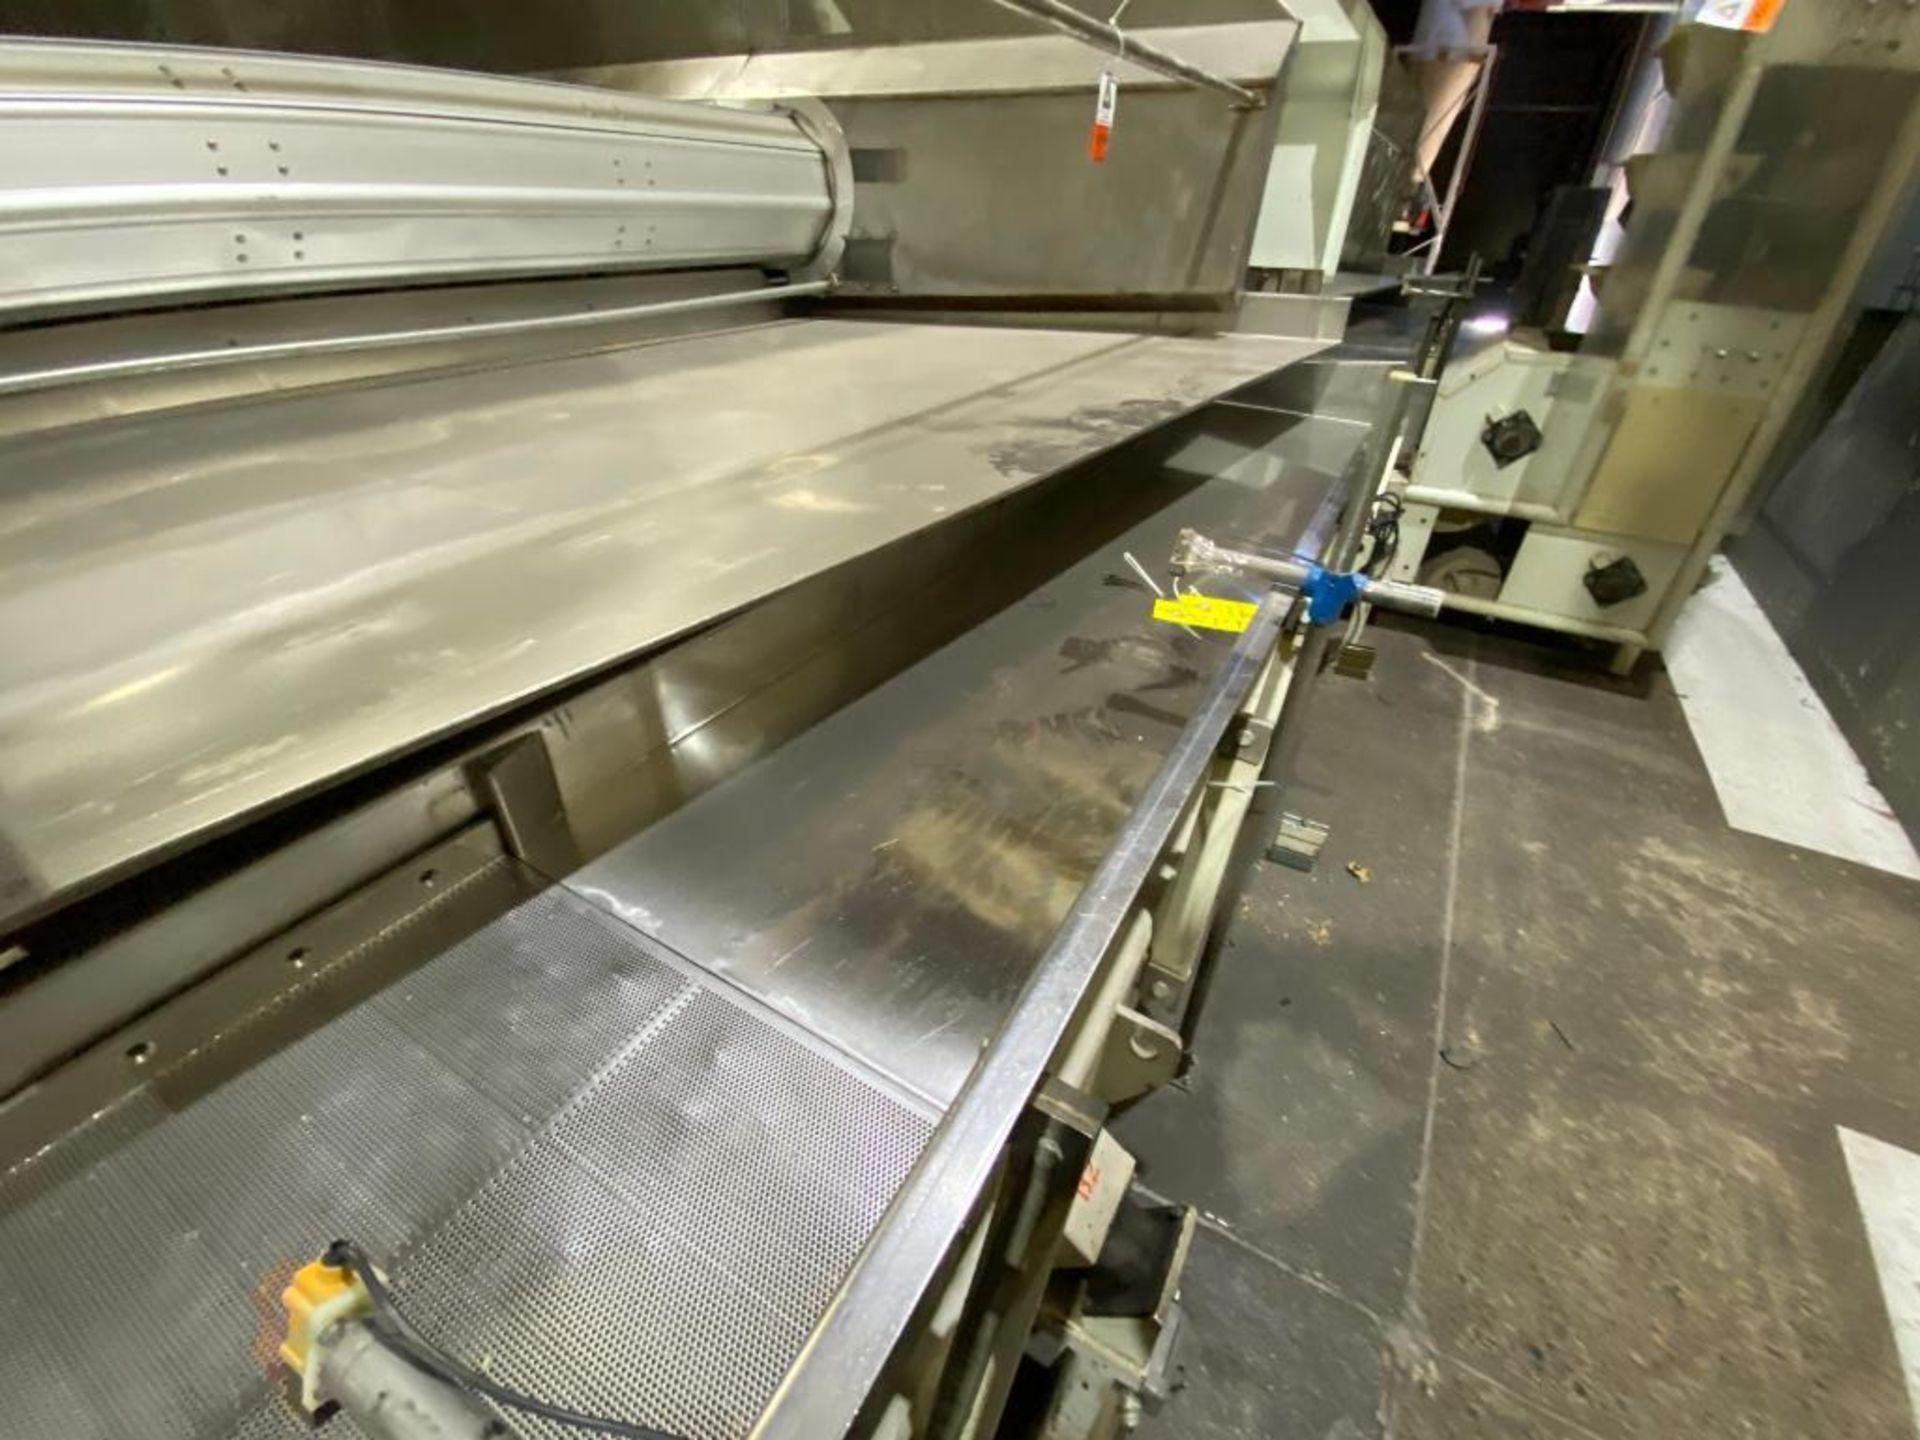 Link Belt vibratory conveyor - Image 3 of 4